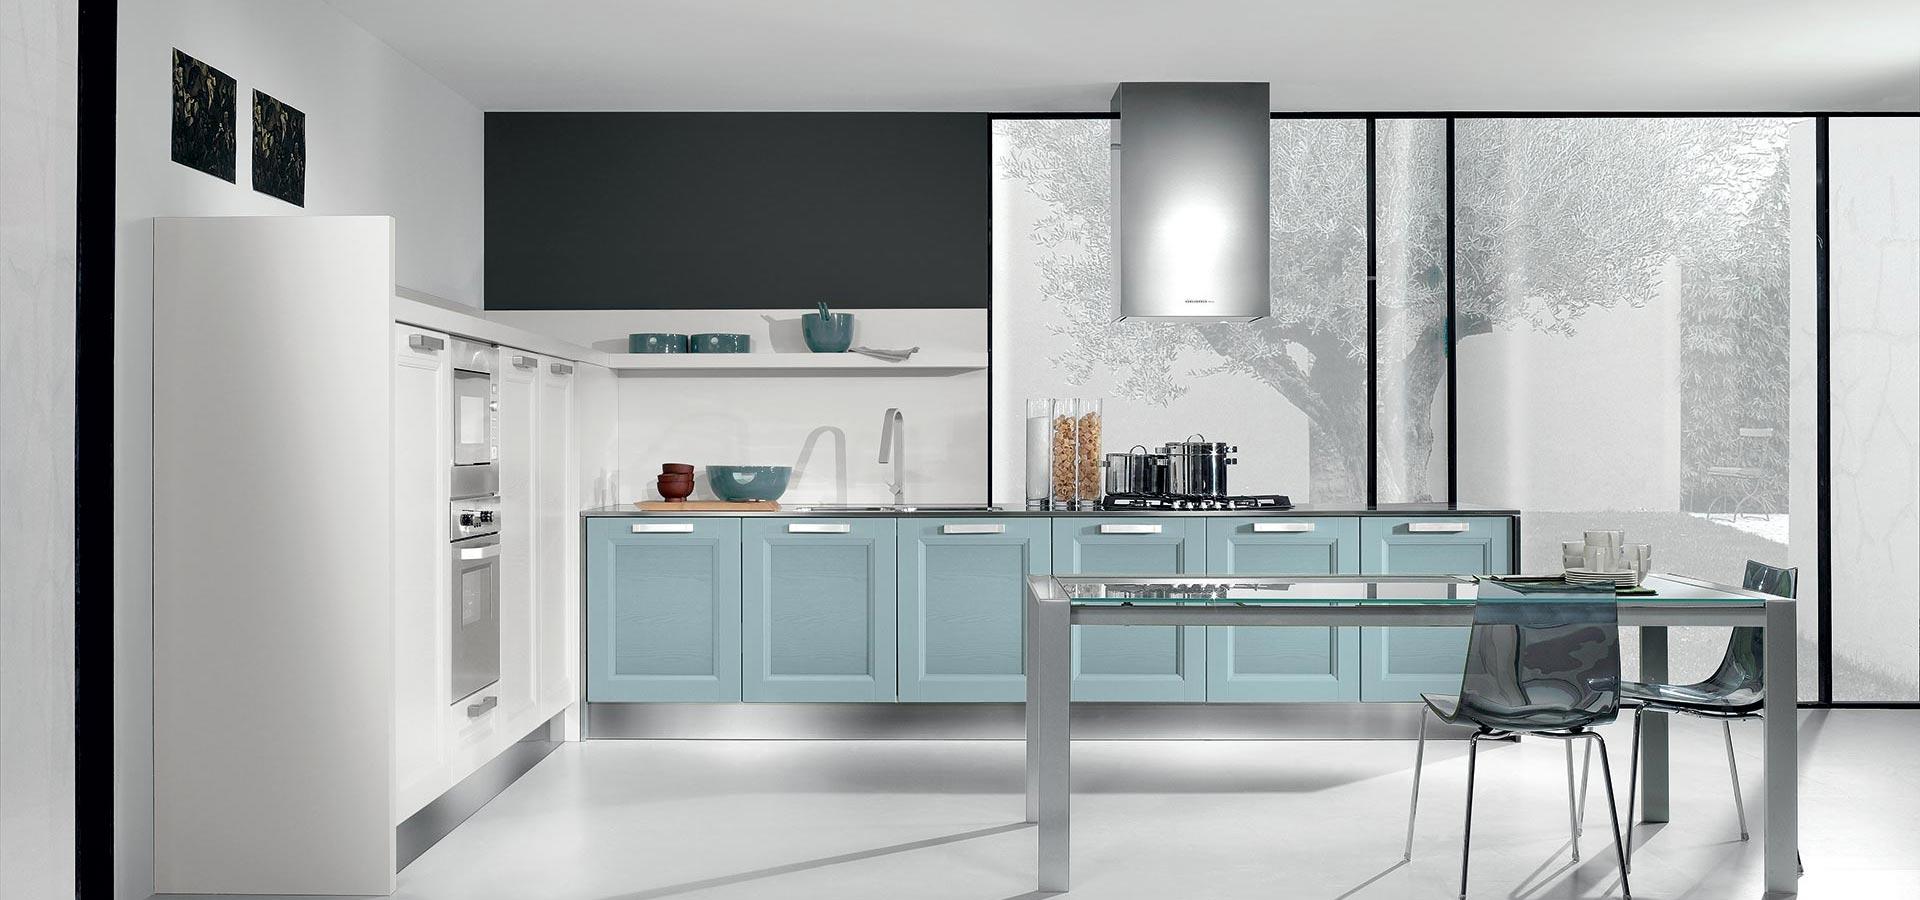 Cucine mobili cau for Mobili cucine professionali